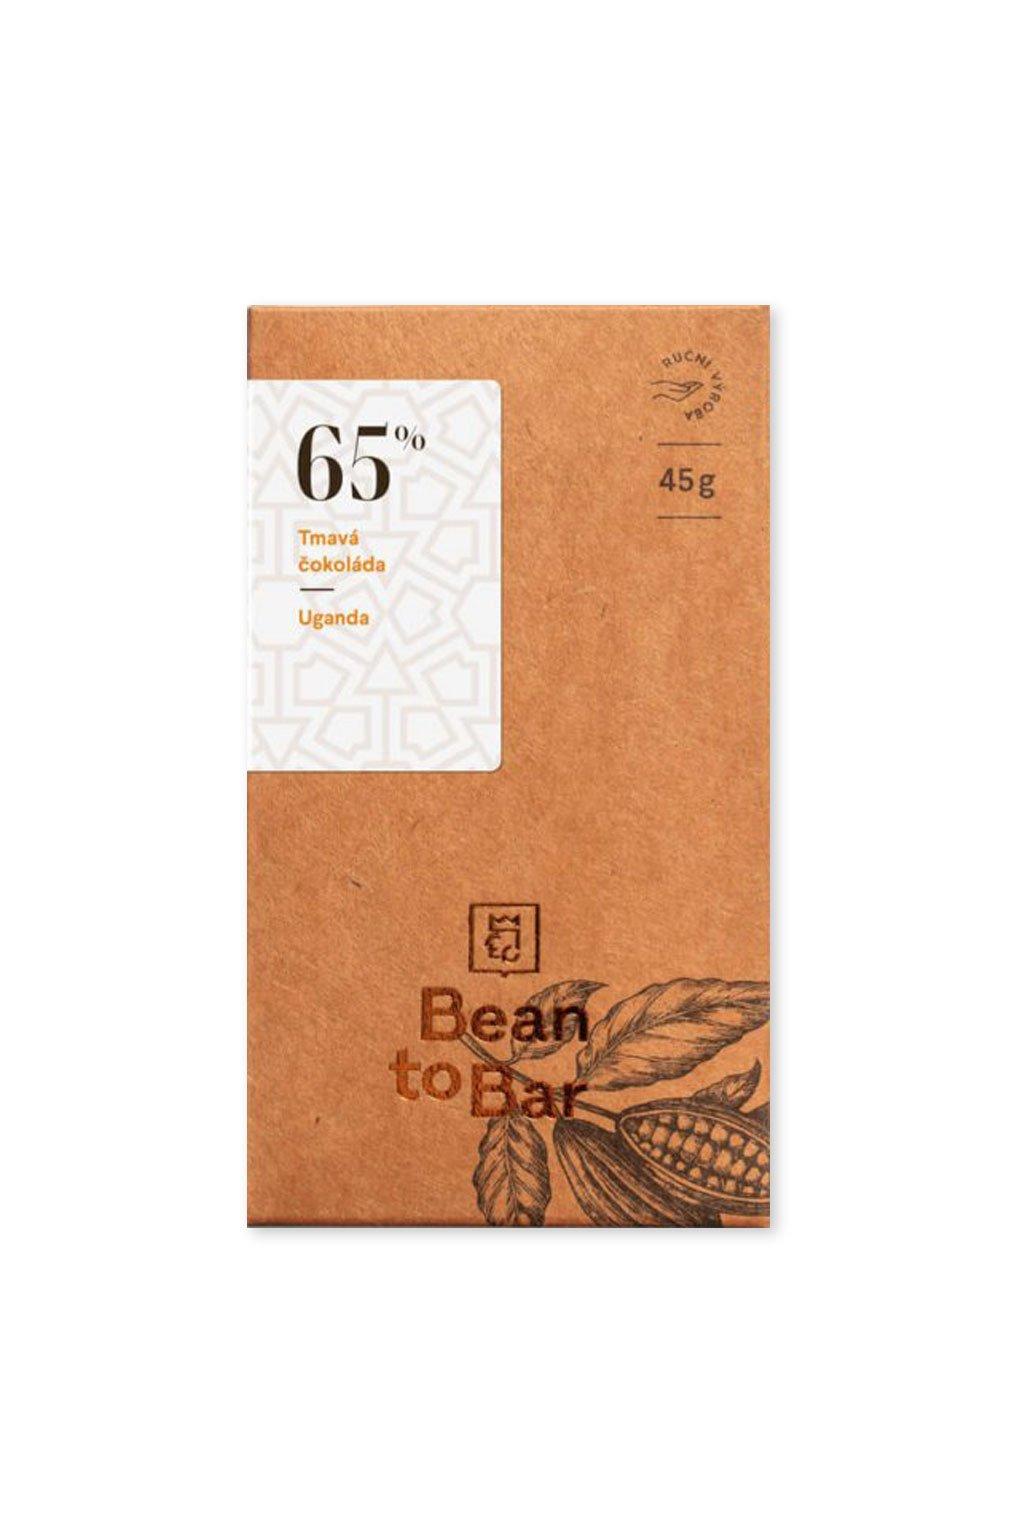 Čokoládovna Janek Tmavá 65% Uganda